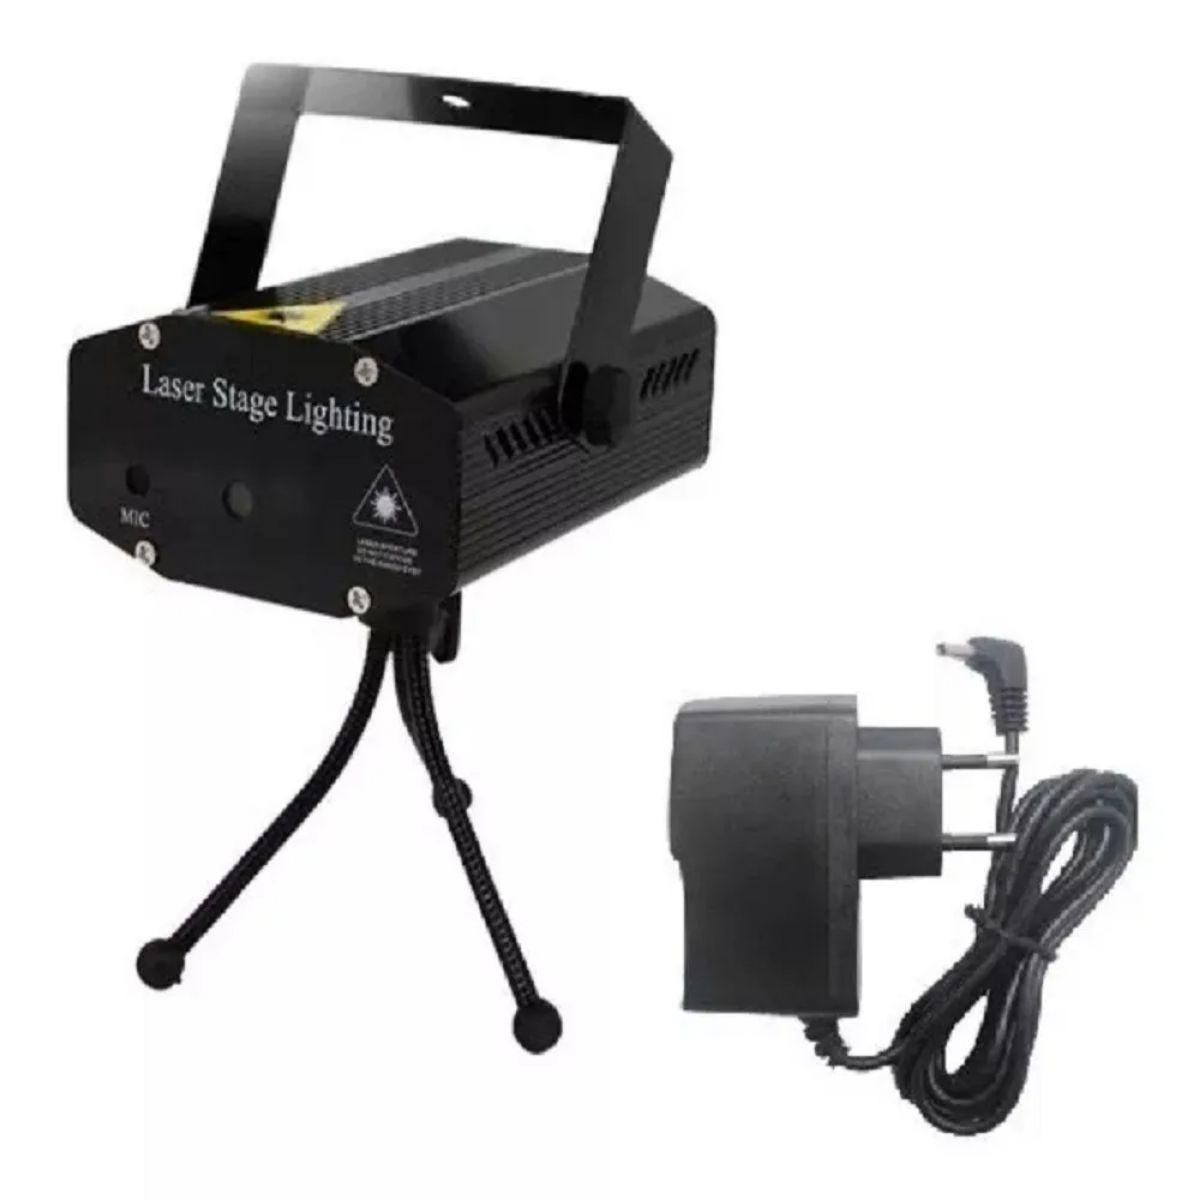 Mini Laser Projetor Holográfico Stage Lighting Preto E Azul - SD-120